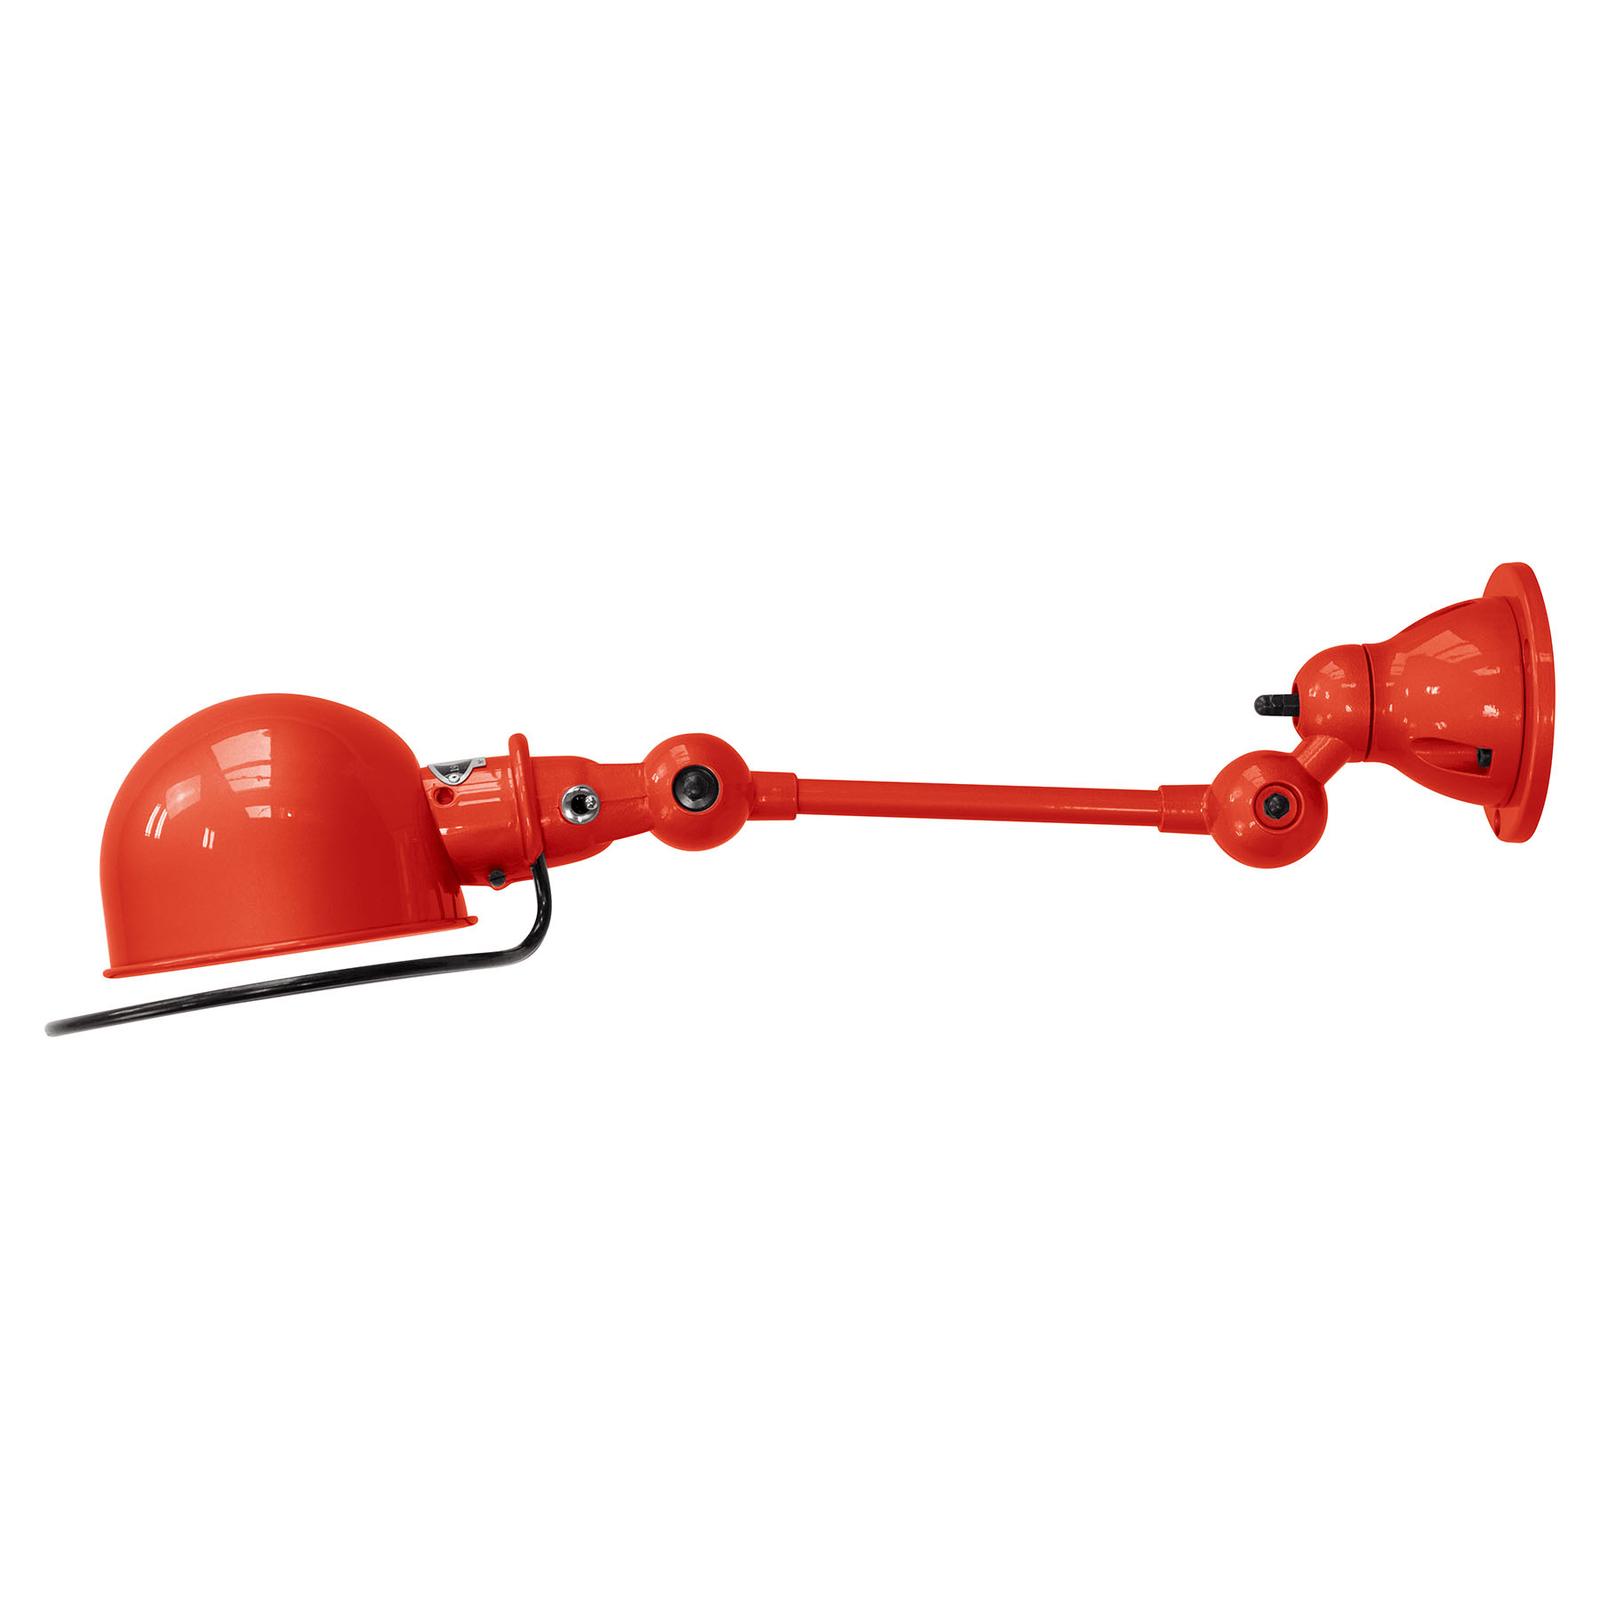 Jieldé Loft D2501 flexibele wandlamp, rood